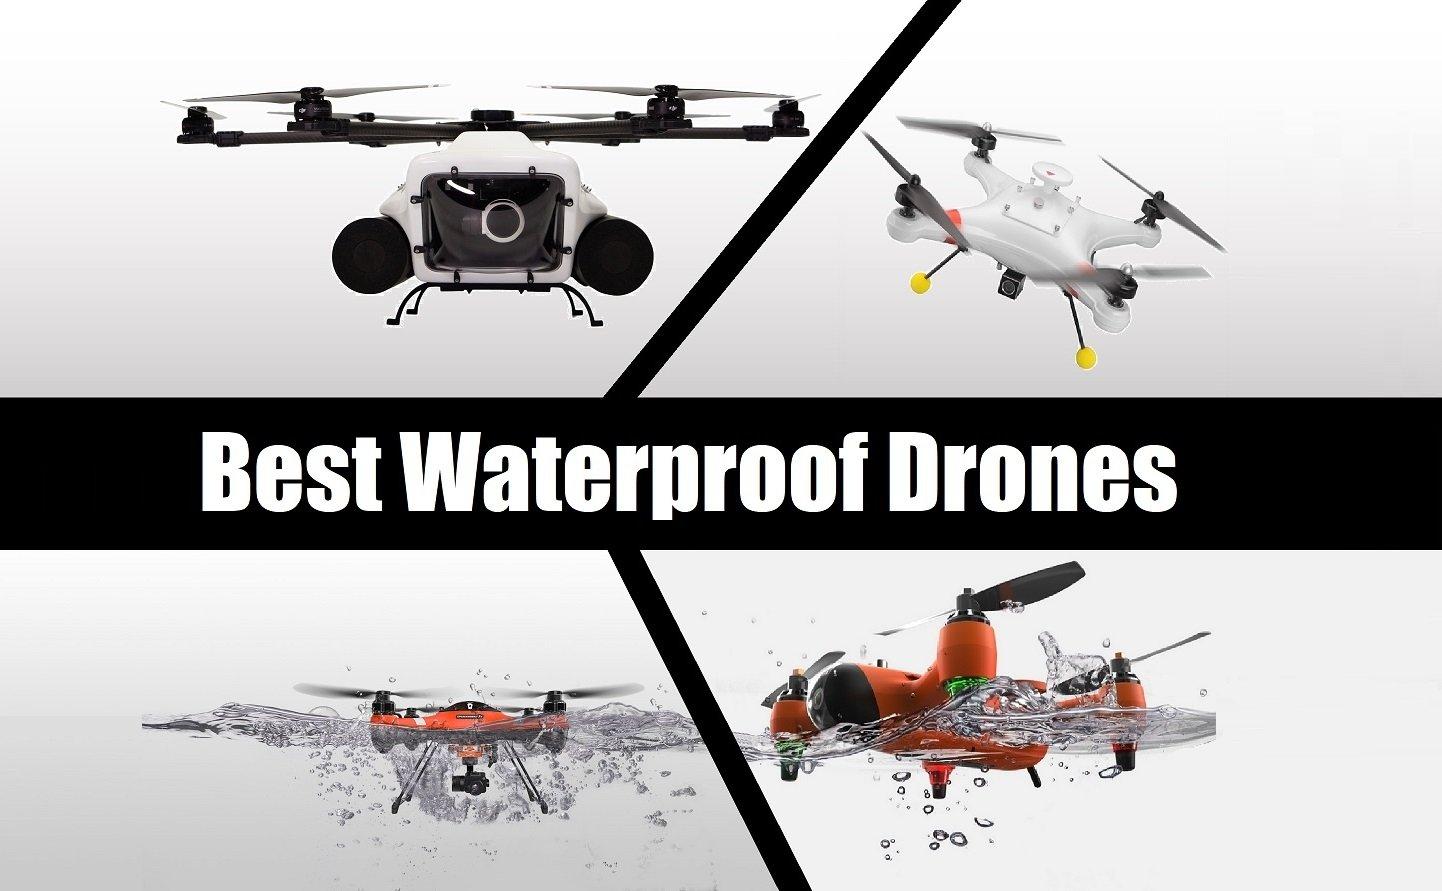 8 Best waterproof drones January 2019 – Great waterproof quadcopters